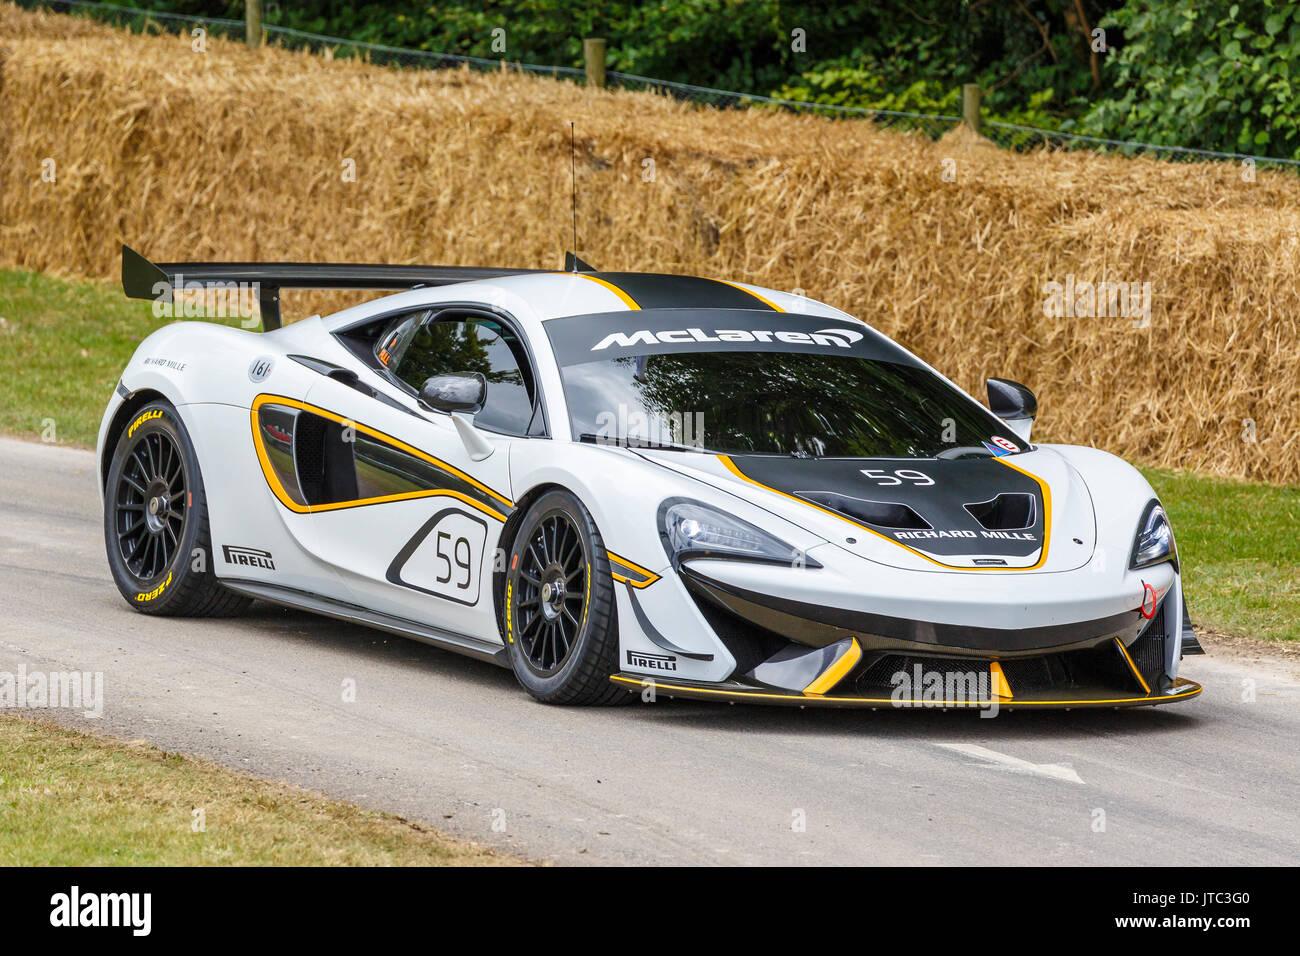 2017 mclaren 570s gt4 endurance racer at the 2017 goodwood festival